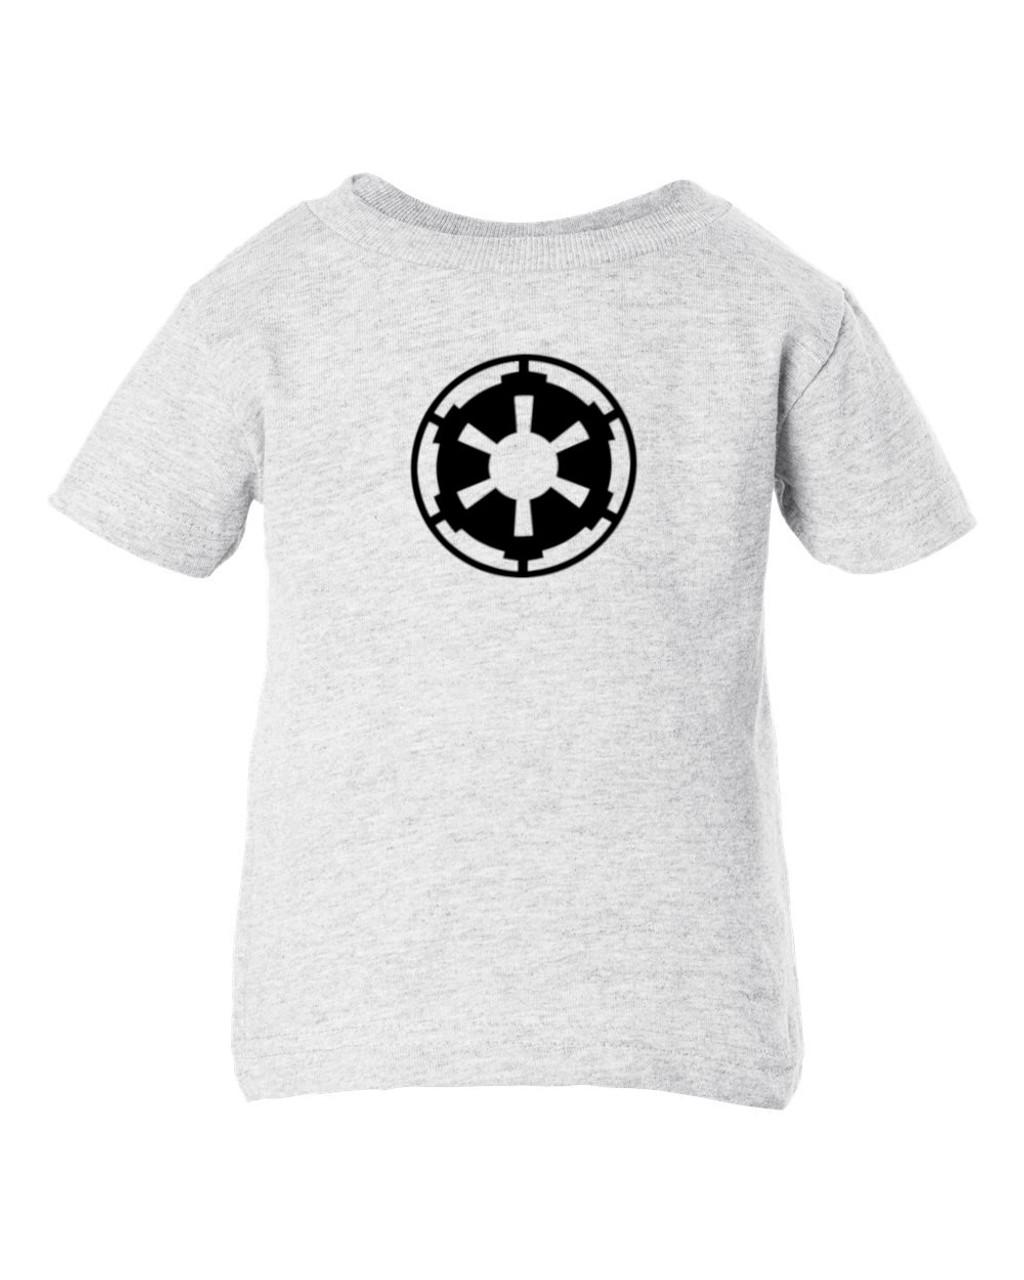 Storm Trooper Imperial Empire Emblem Baby Toddler Ash T-Shirt